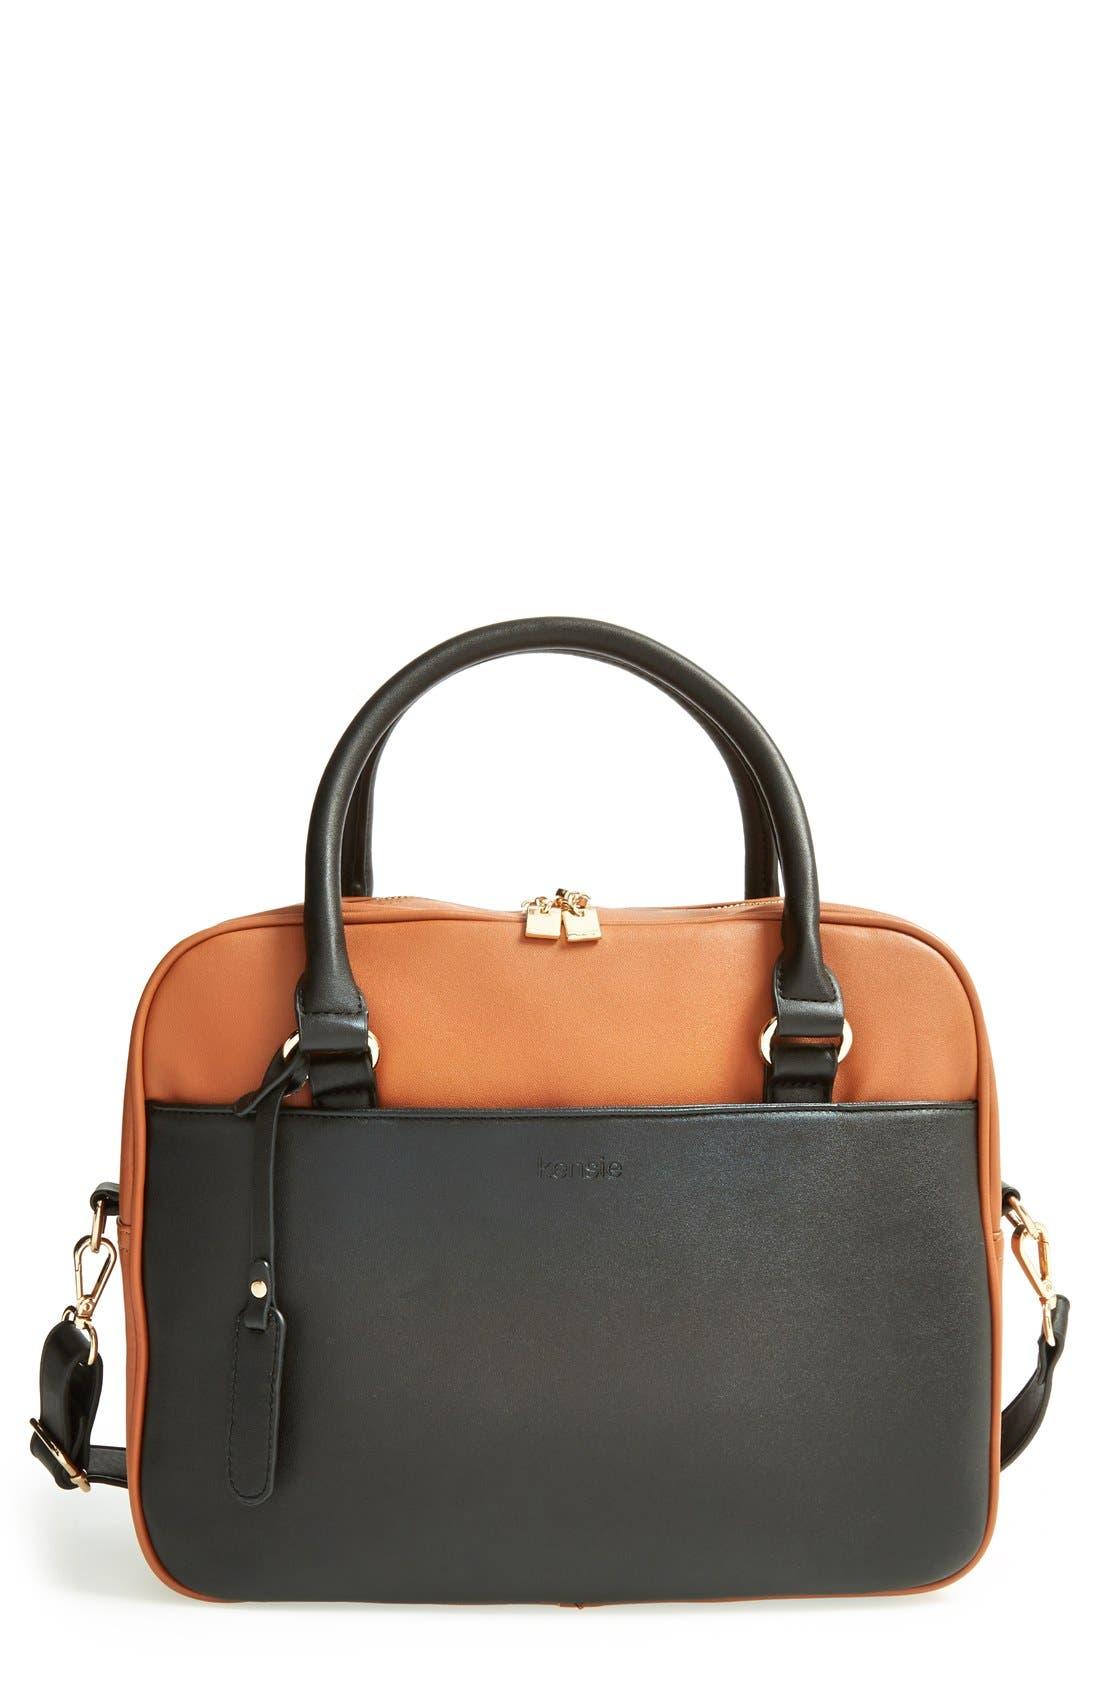 Alternate Image 1 Selected - kensie 'Block Party' Color Block Handbag